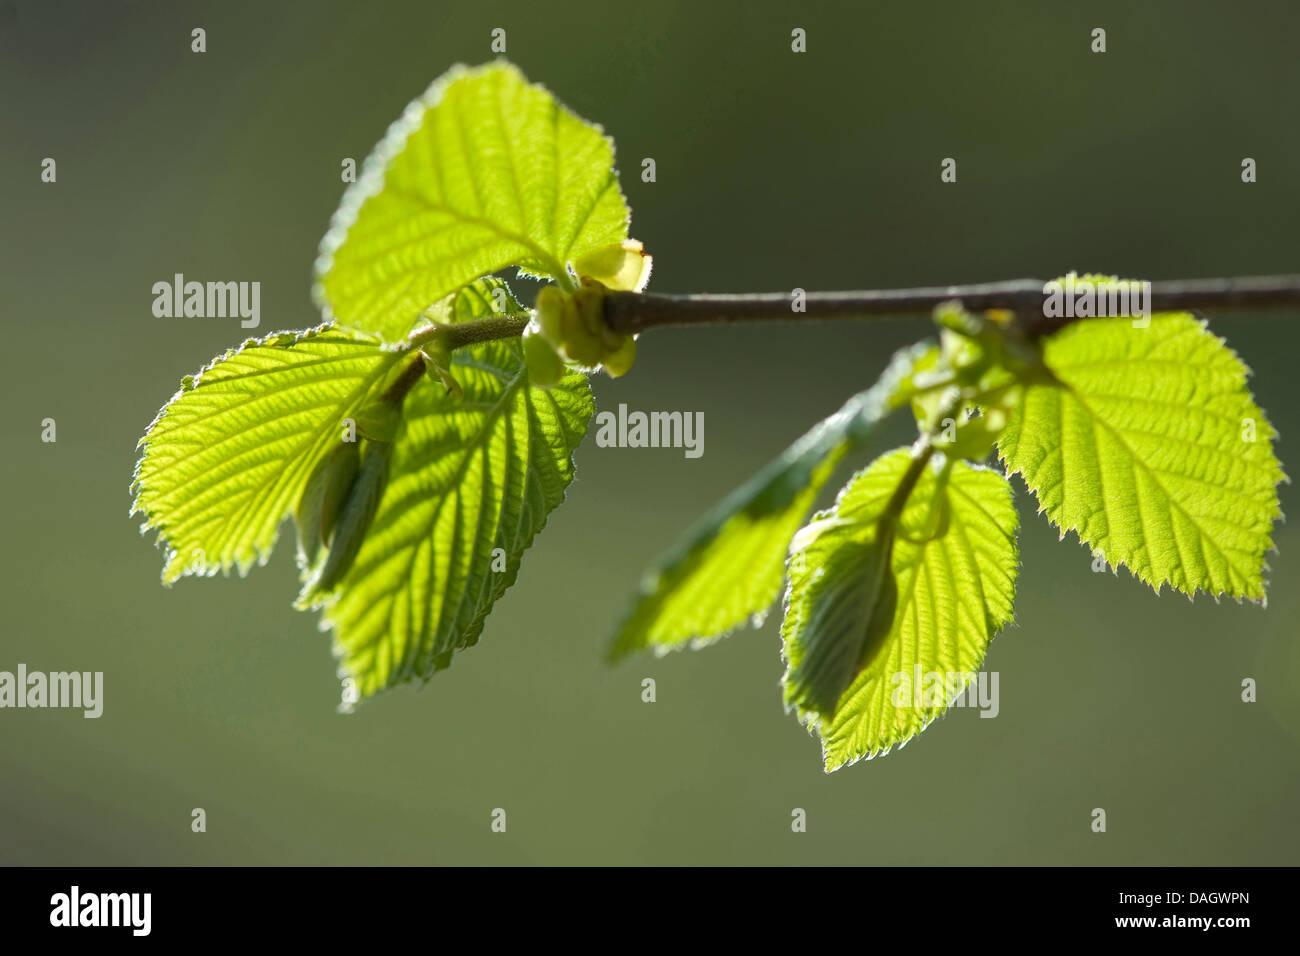 Common hazel (Corylus avellana), twig with hazelnut leaves, Germany - Stock Image